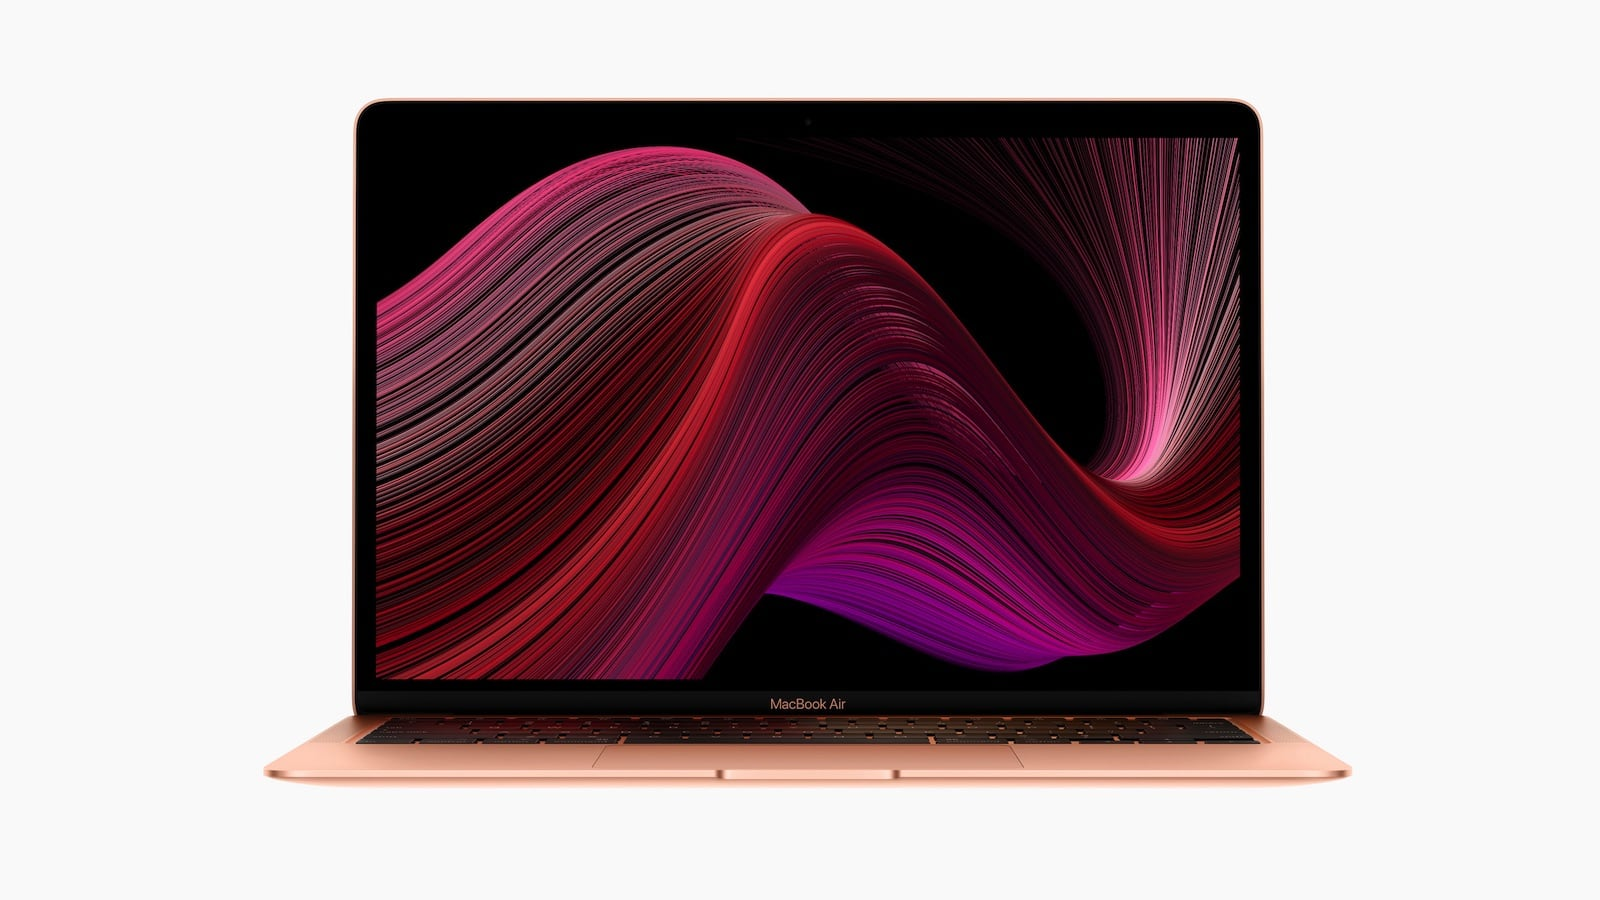 Apple MacBook Air 2020 Version Laptop has a Retina display with 4 million pixels